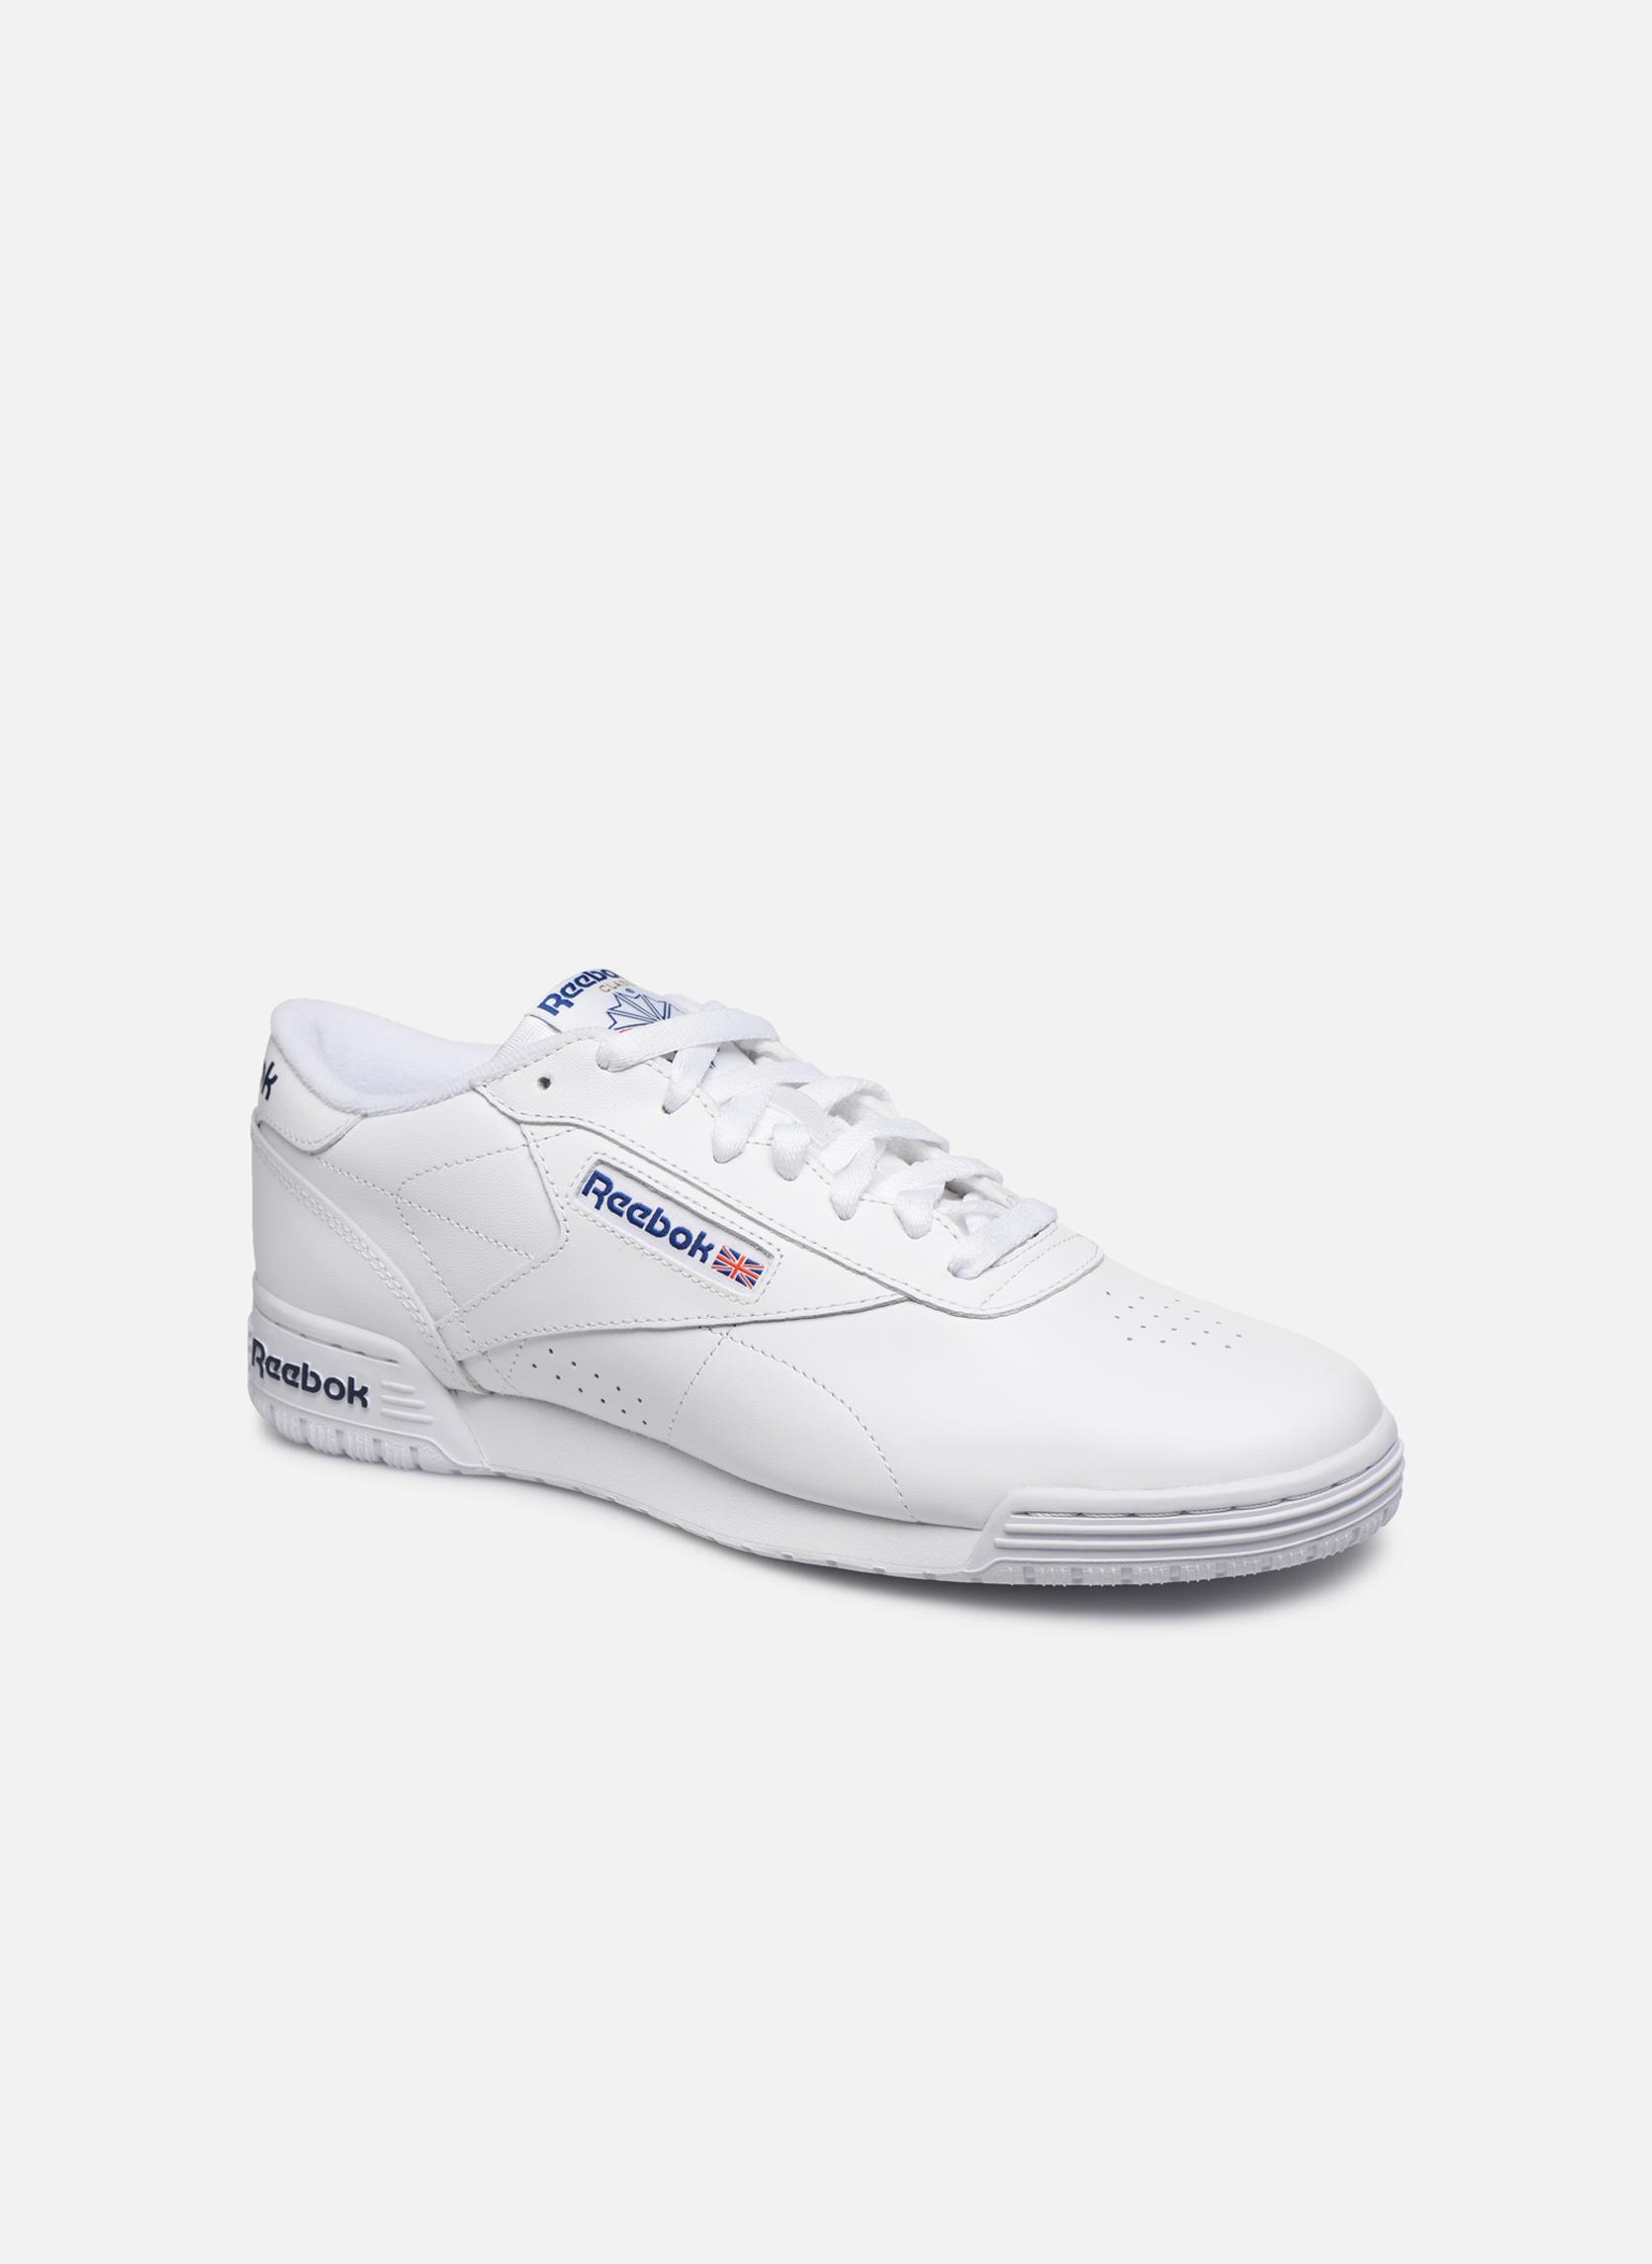 Exofit Lo Clean Logo Int Int-White/Royal Blue/Royal Blue